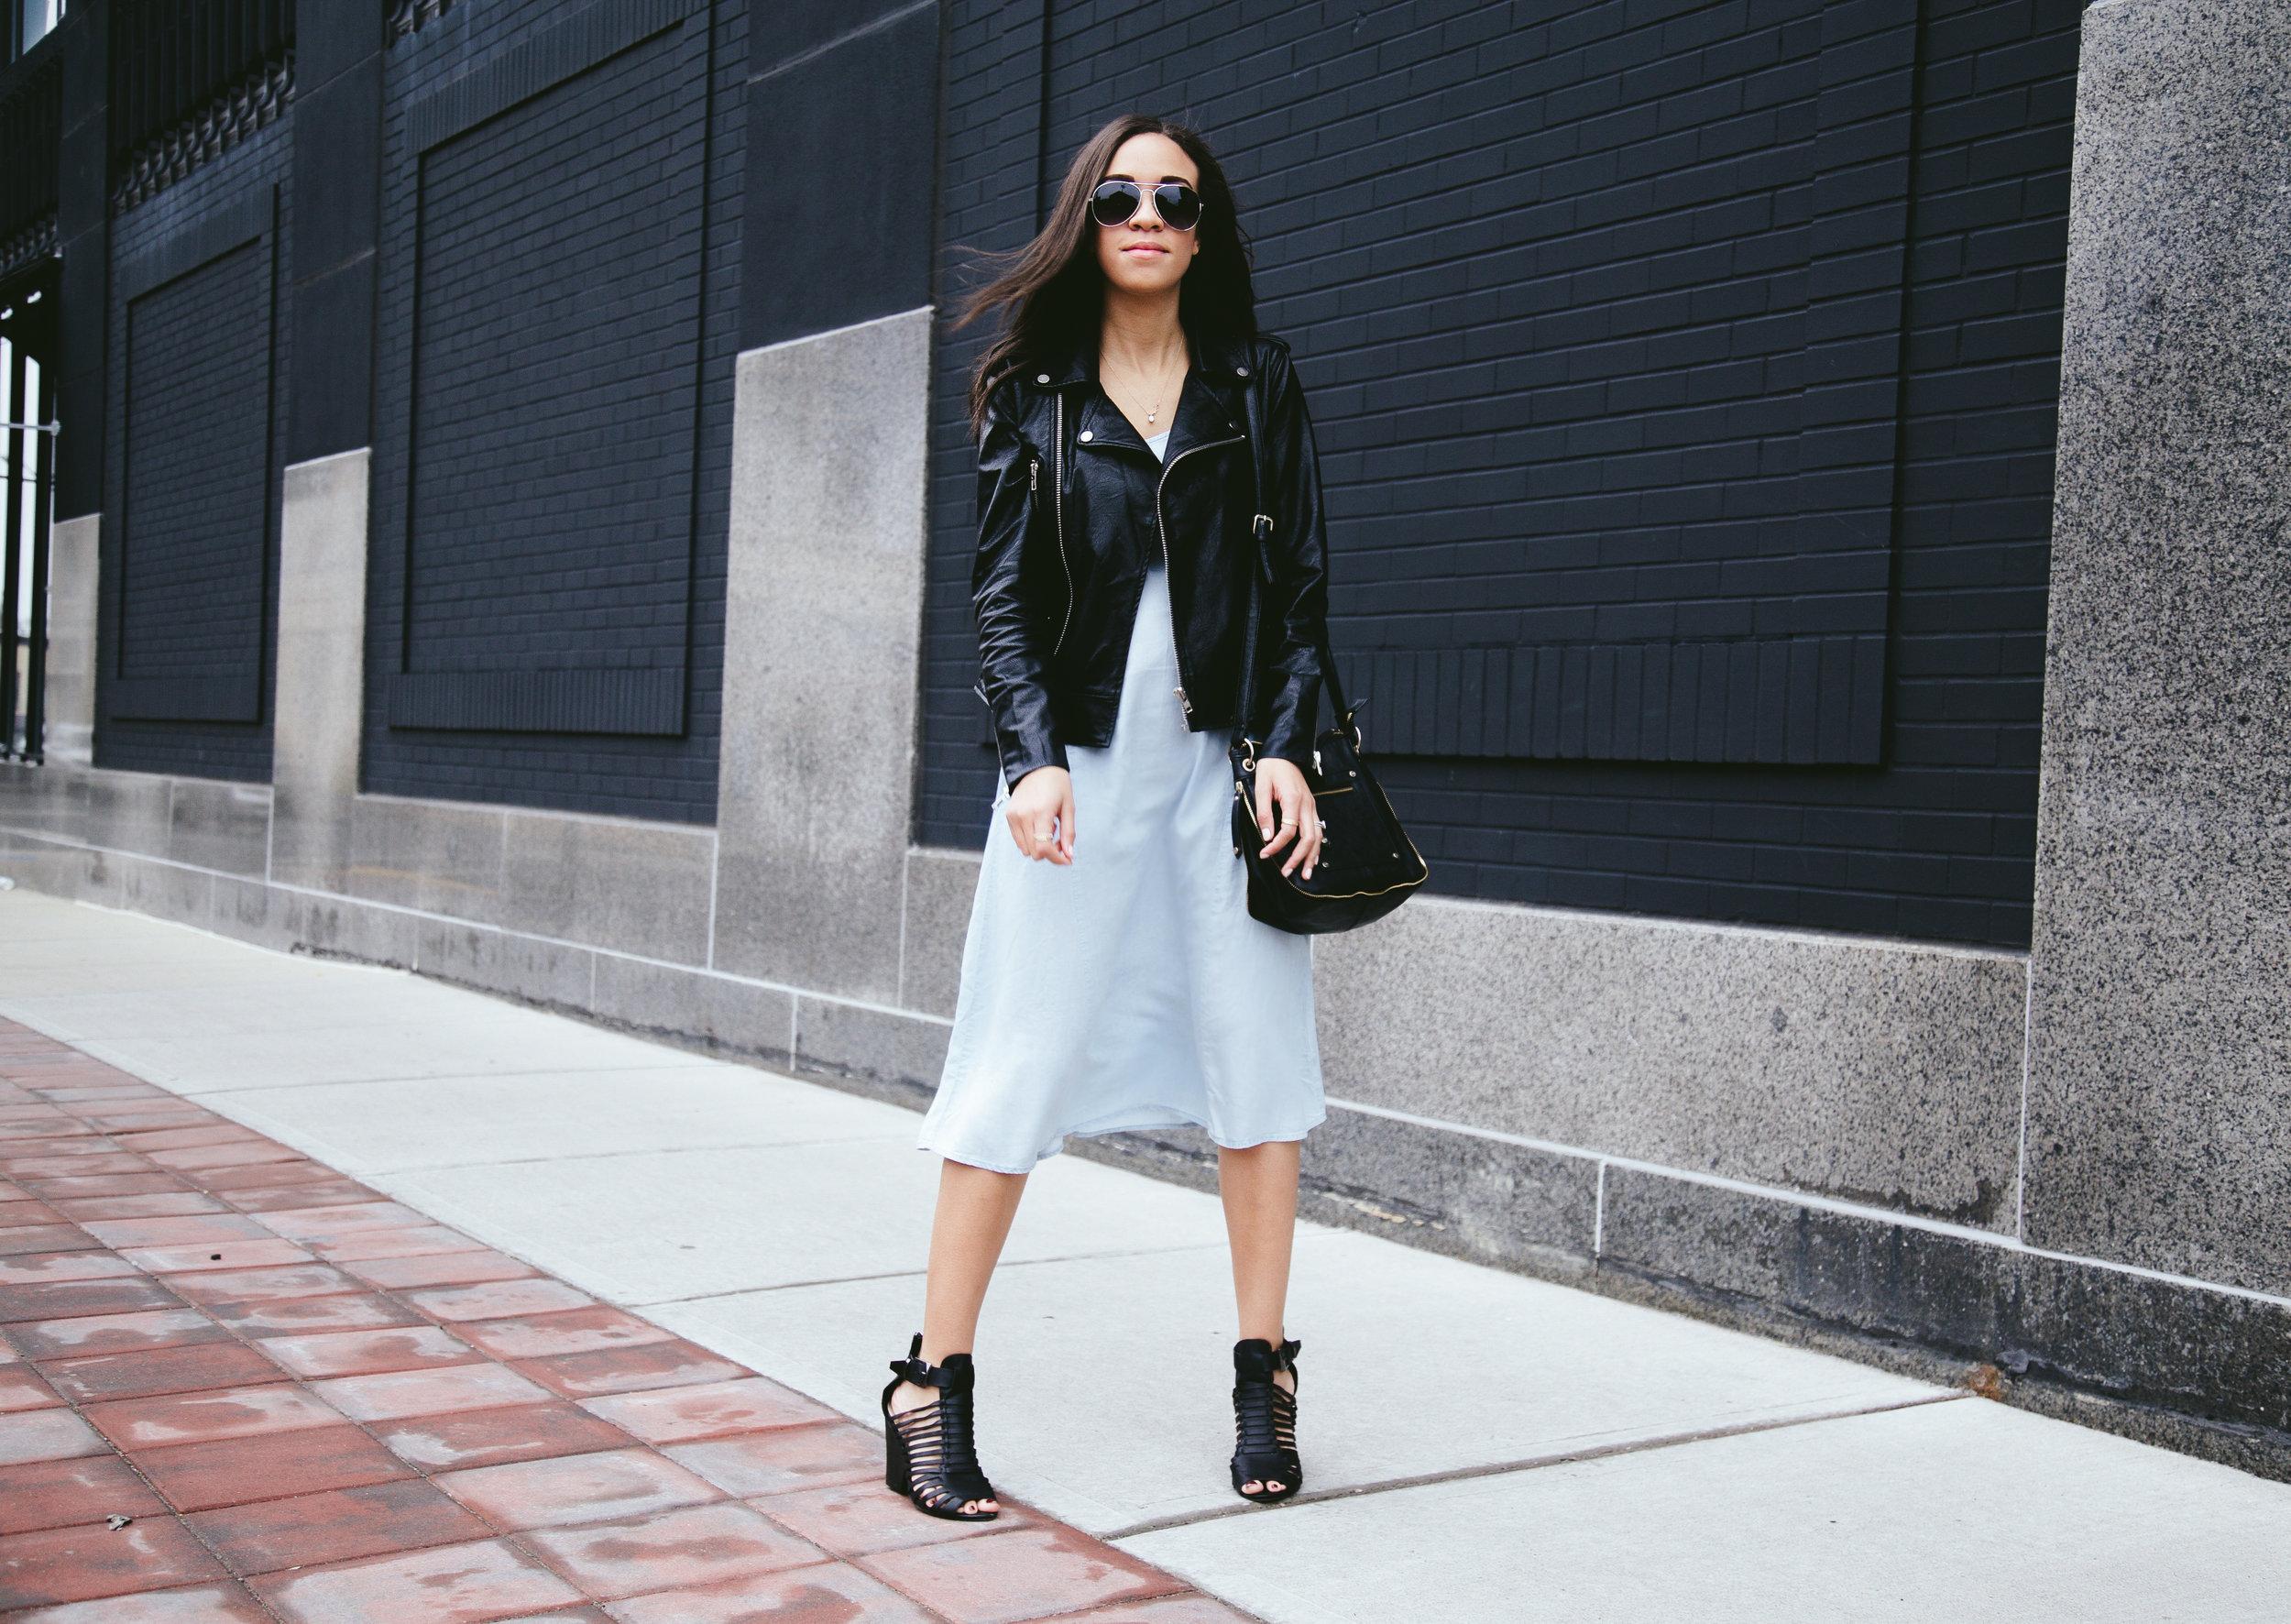 Spring Denim Dress + Faux Leather Jacket 3.jpg